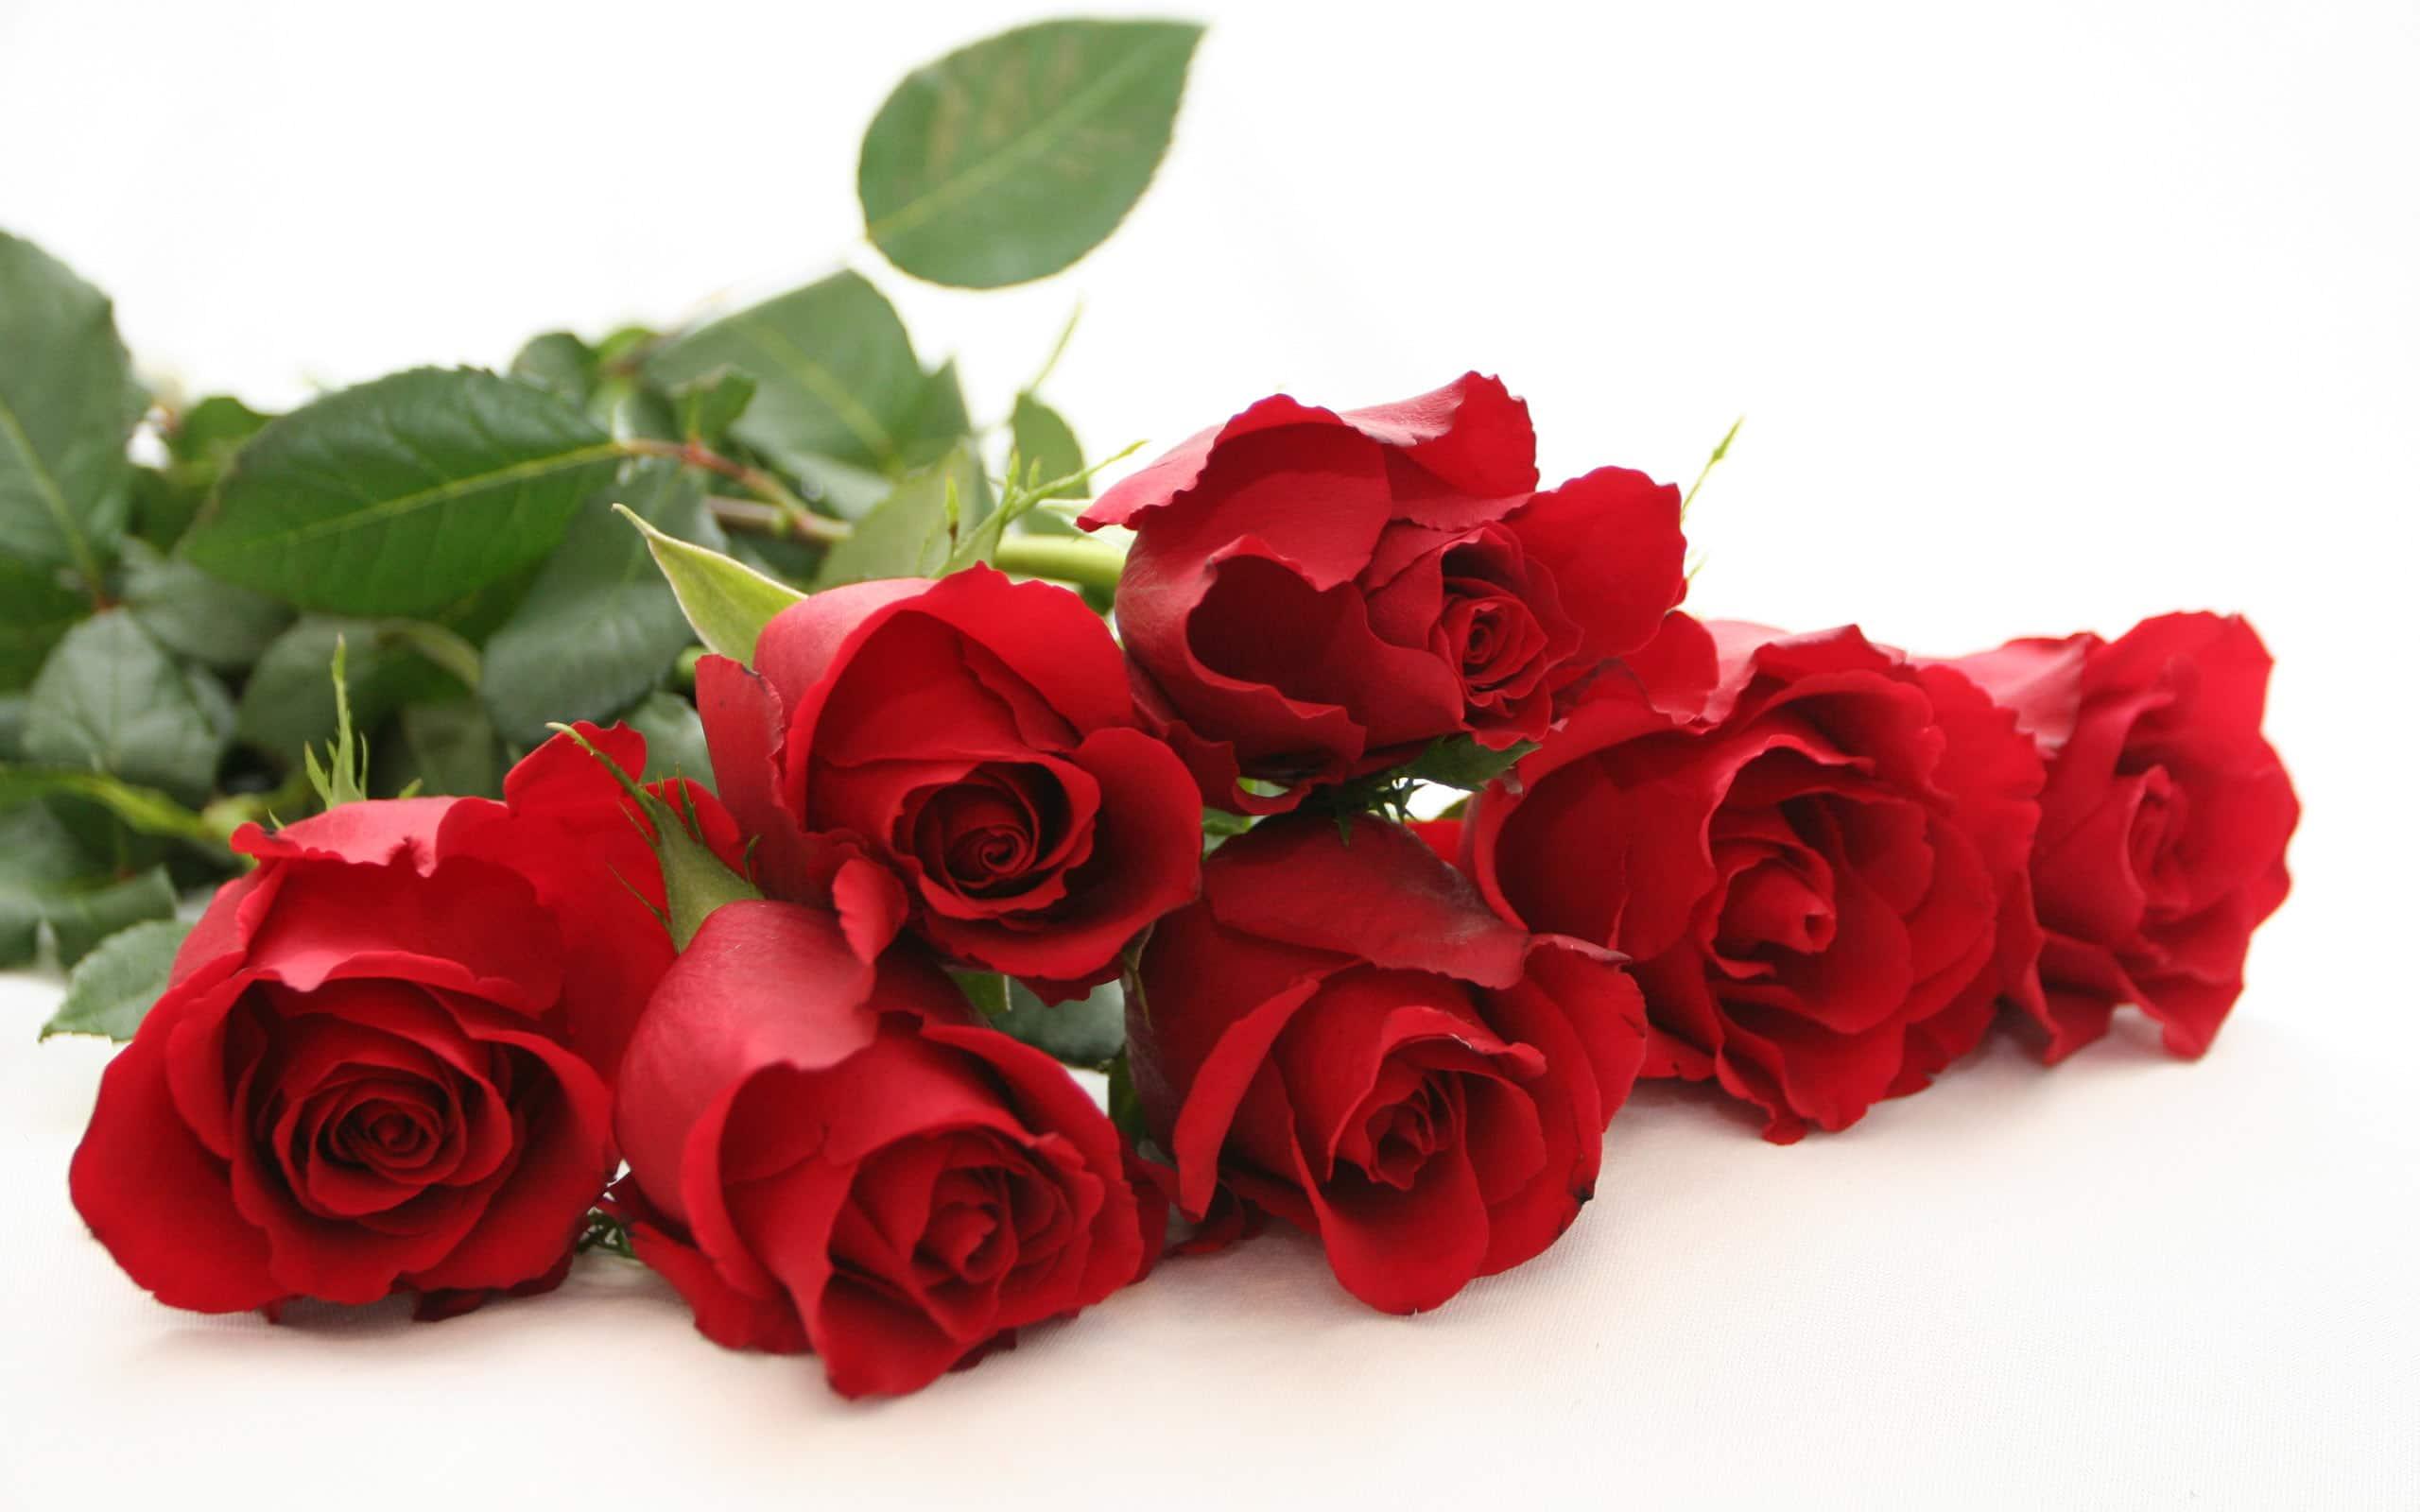 Rose rosse per dire Ti amo